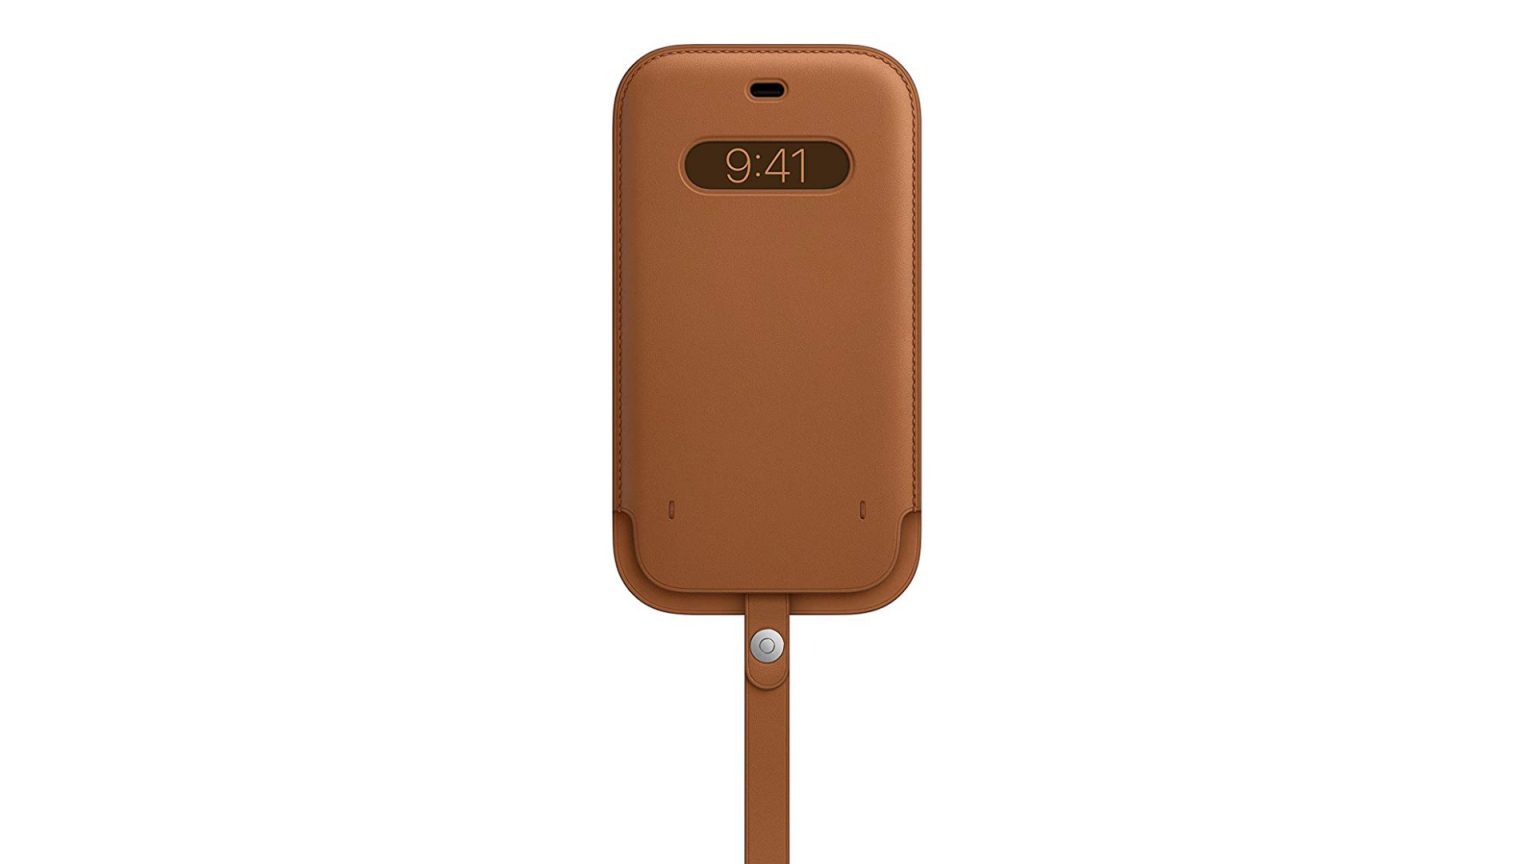 iPhone 12 MagSafe Sleeve case